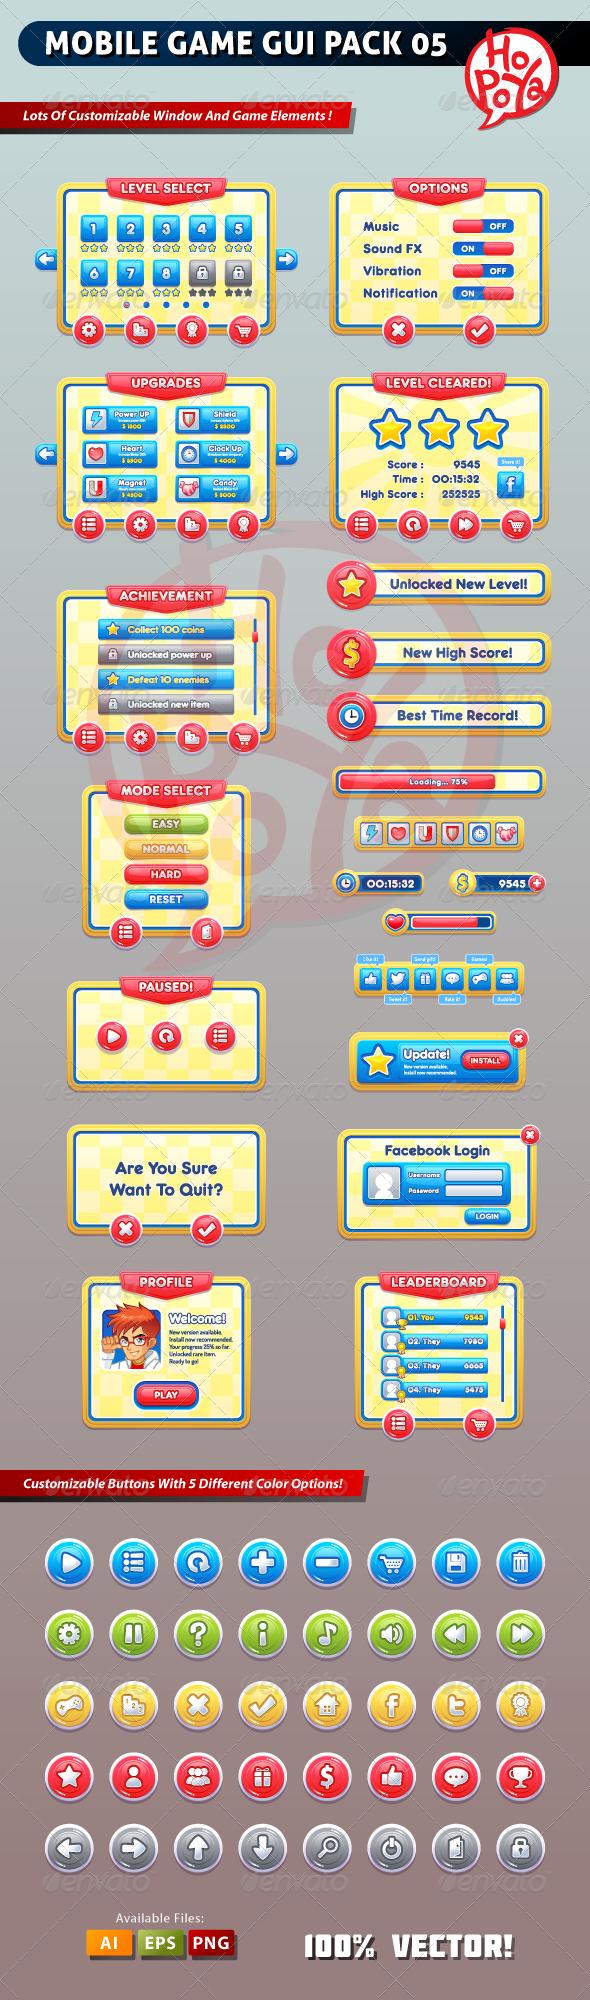 KeMotaku: Mobile Game GUI Pack 05